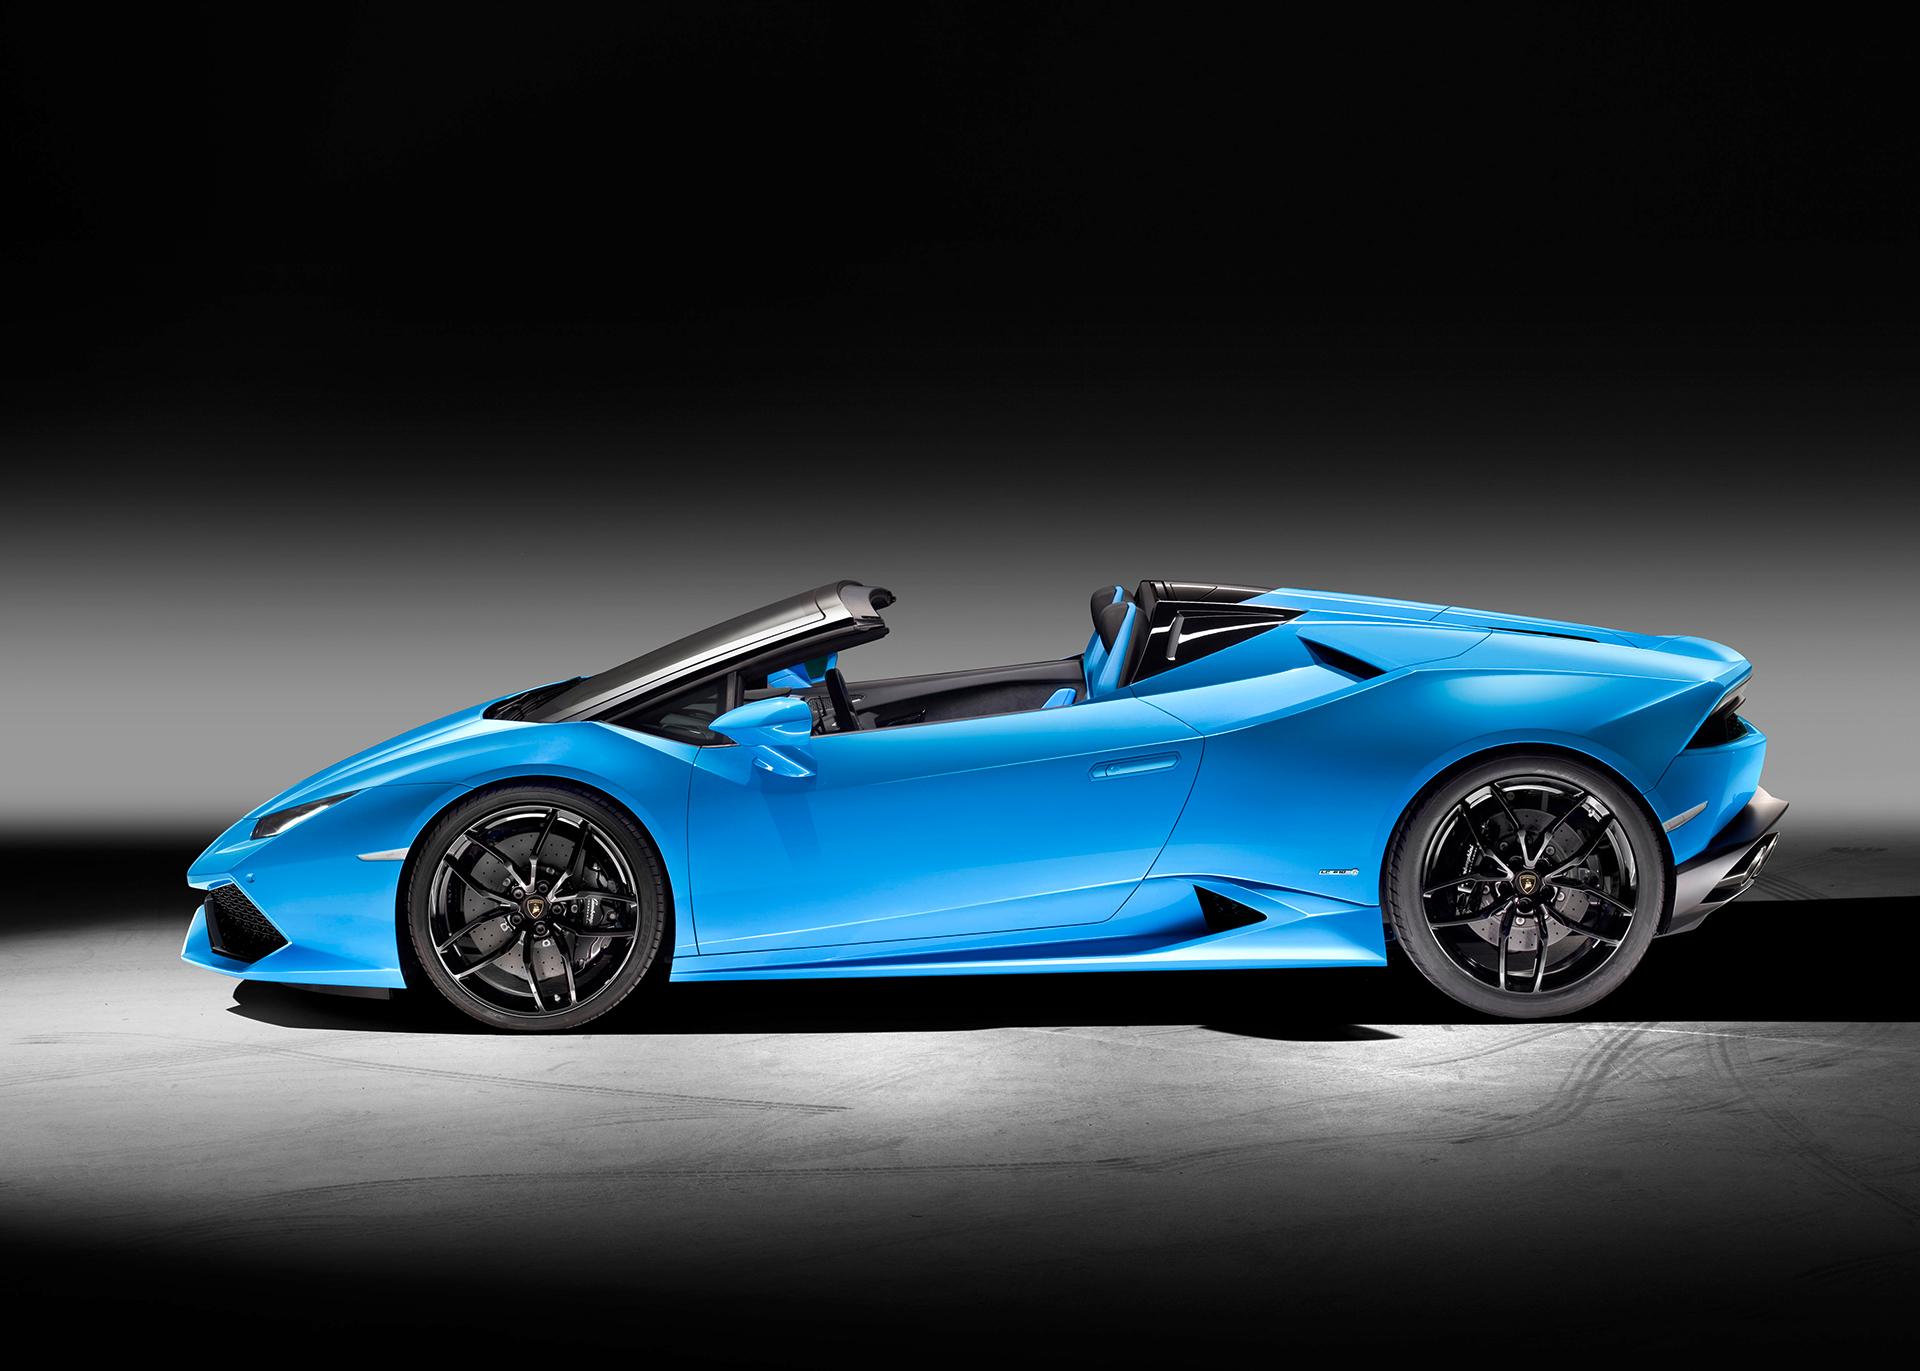 Lamborghini Huracán LP 610-4 Spyder - profil toit ouvert / side-face open top